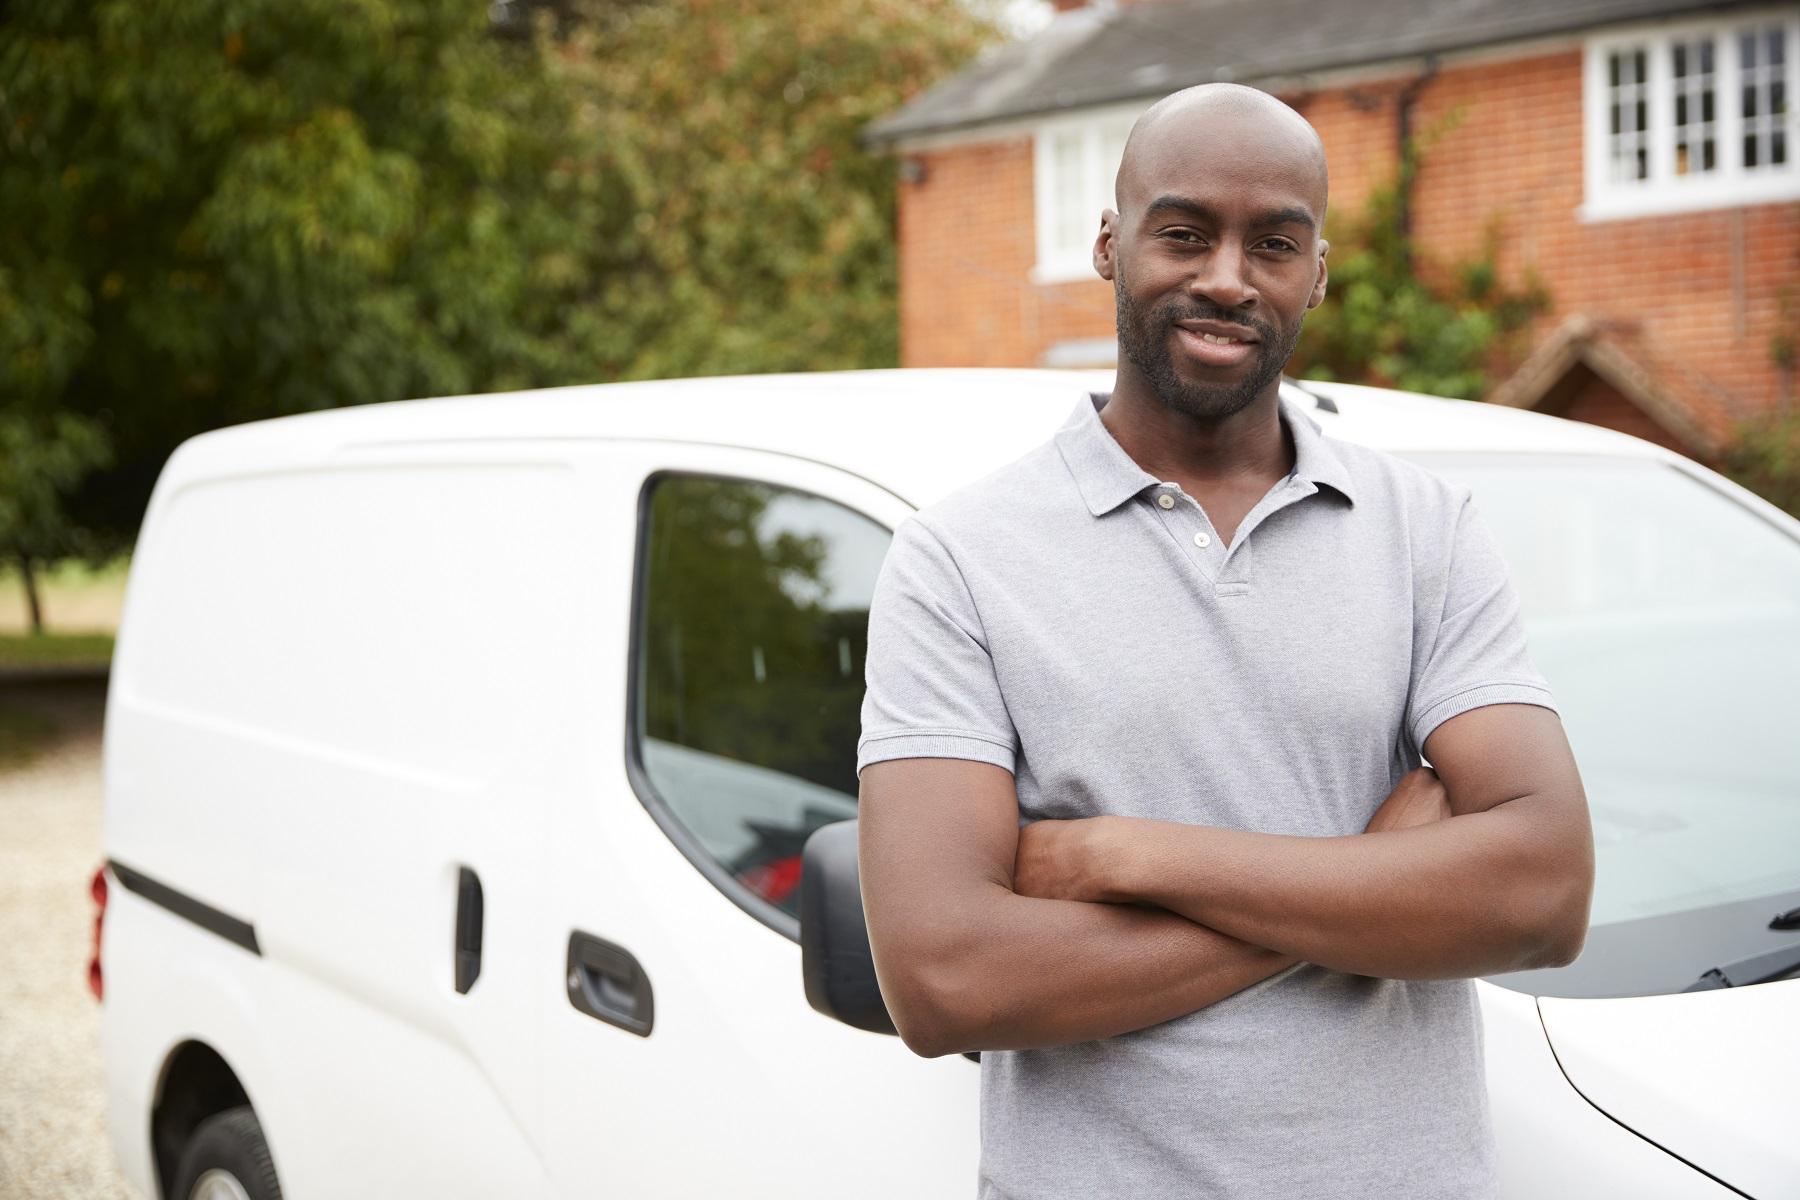 van-design-young-adult-tradesman-standing-next-blank-white-van-needs-vehicle-signage